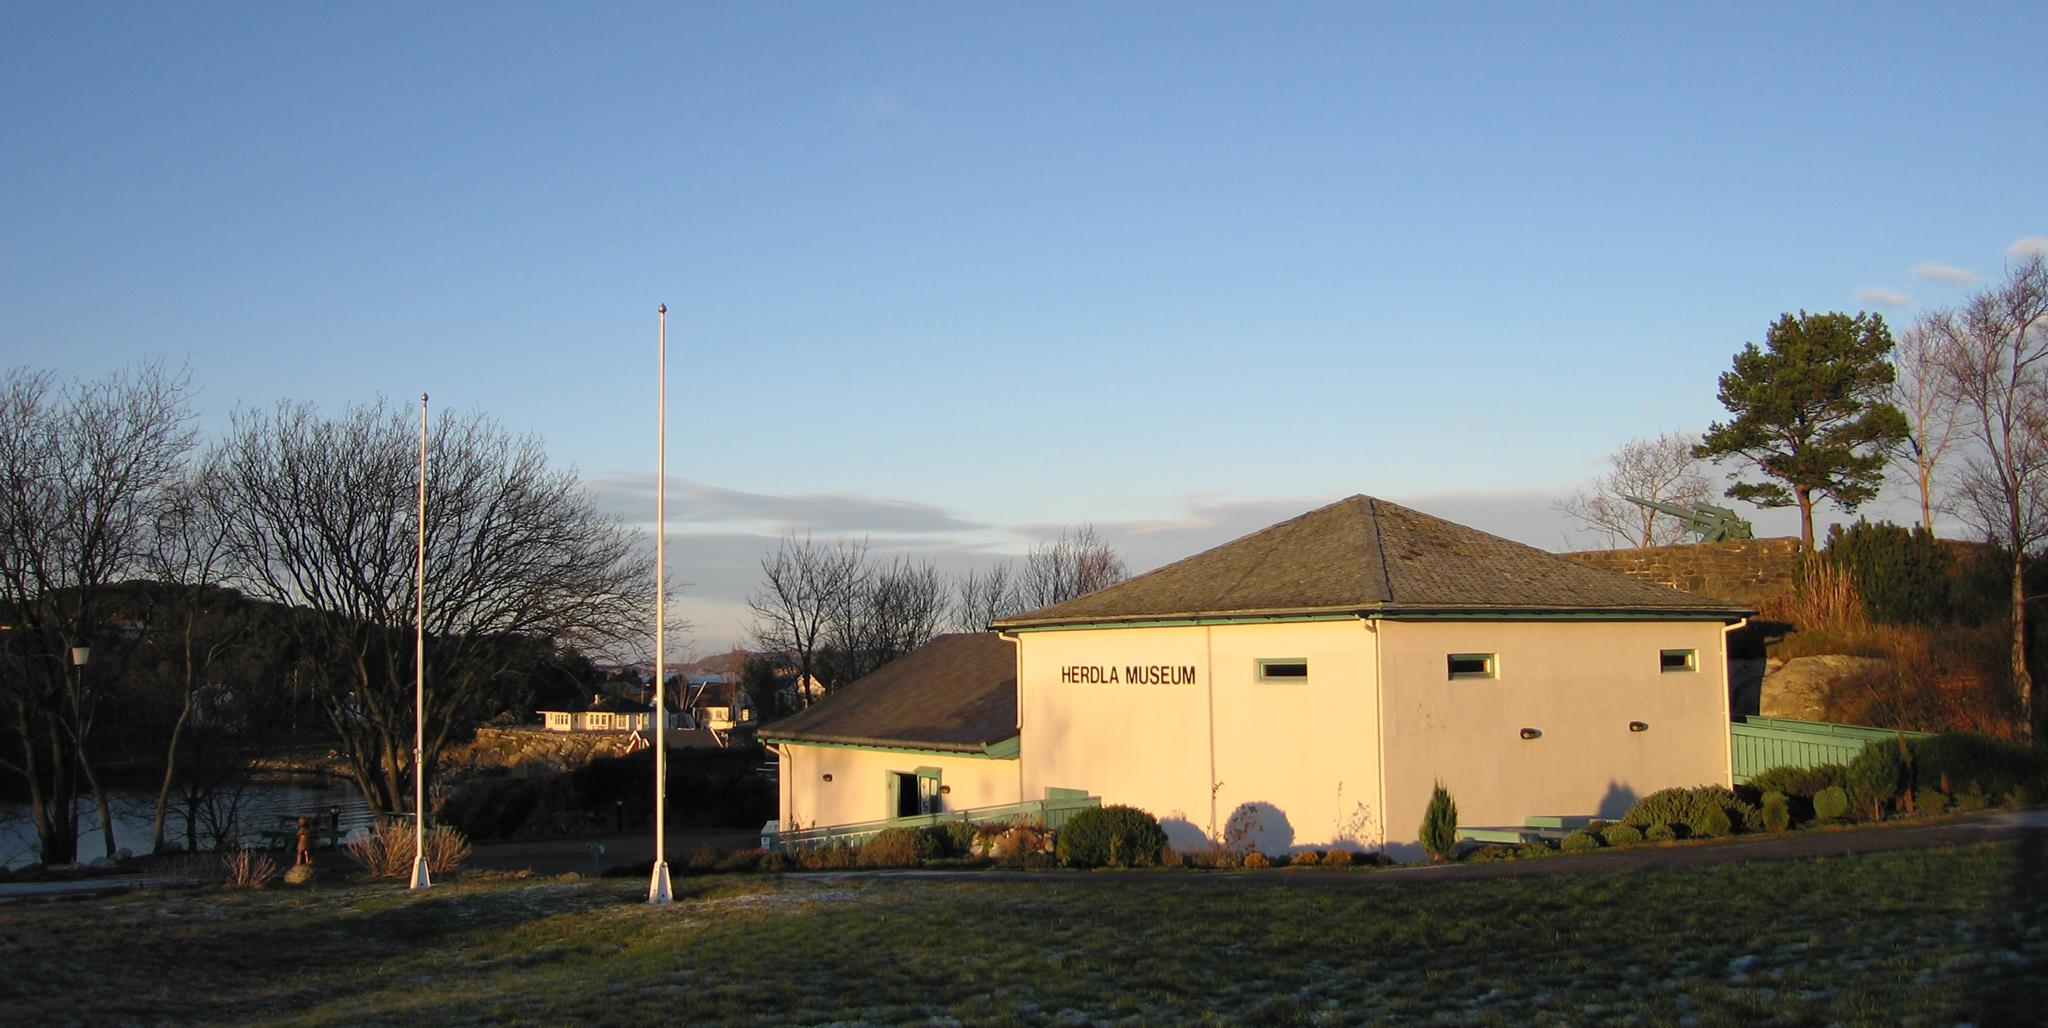 Herdla Museum